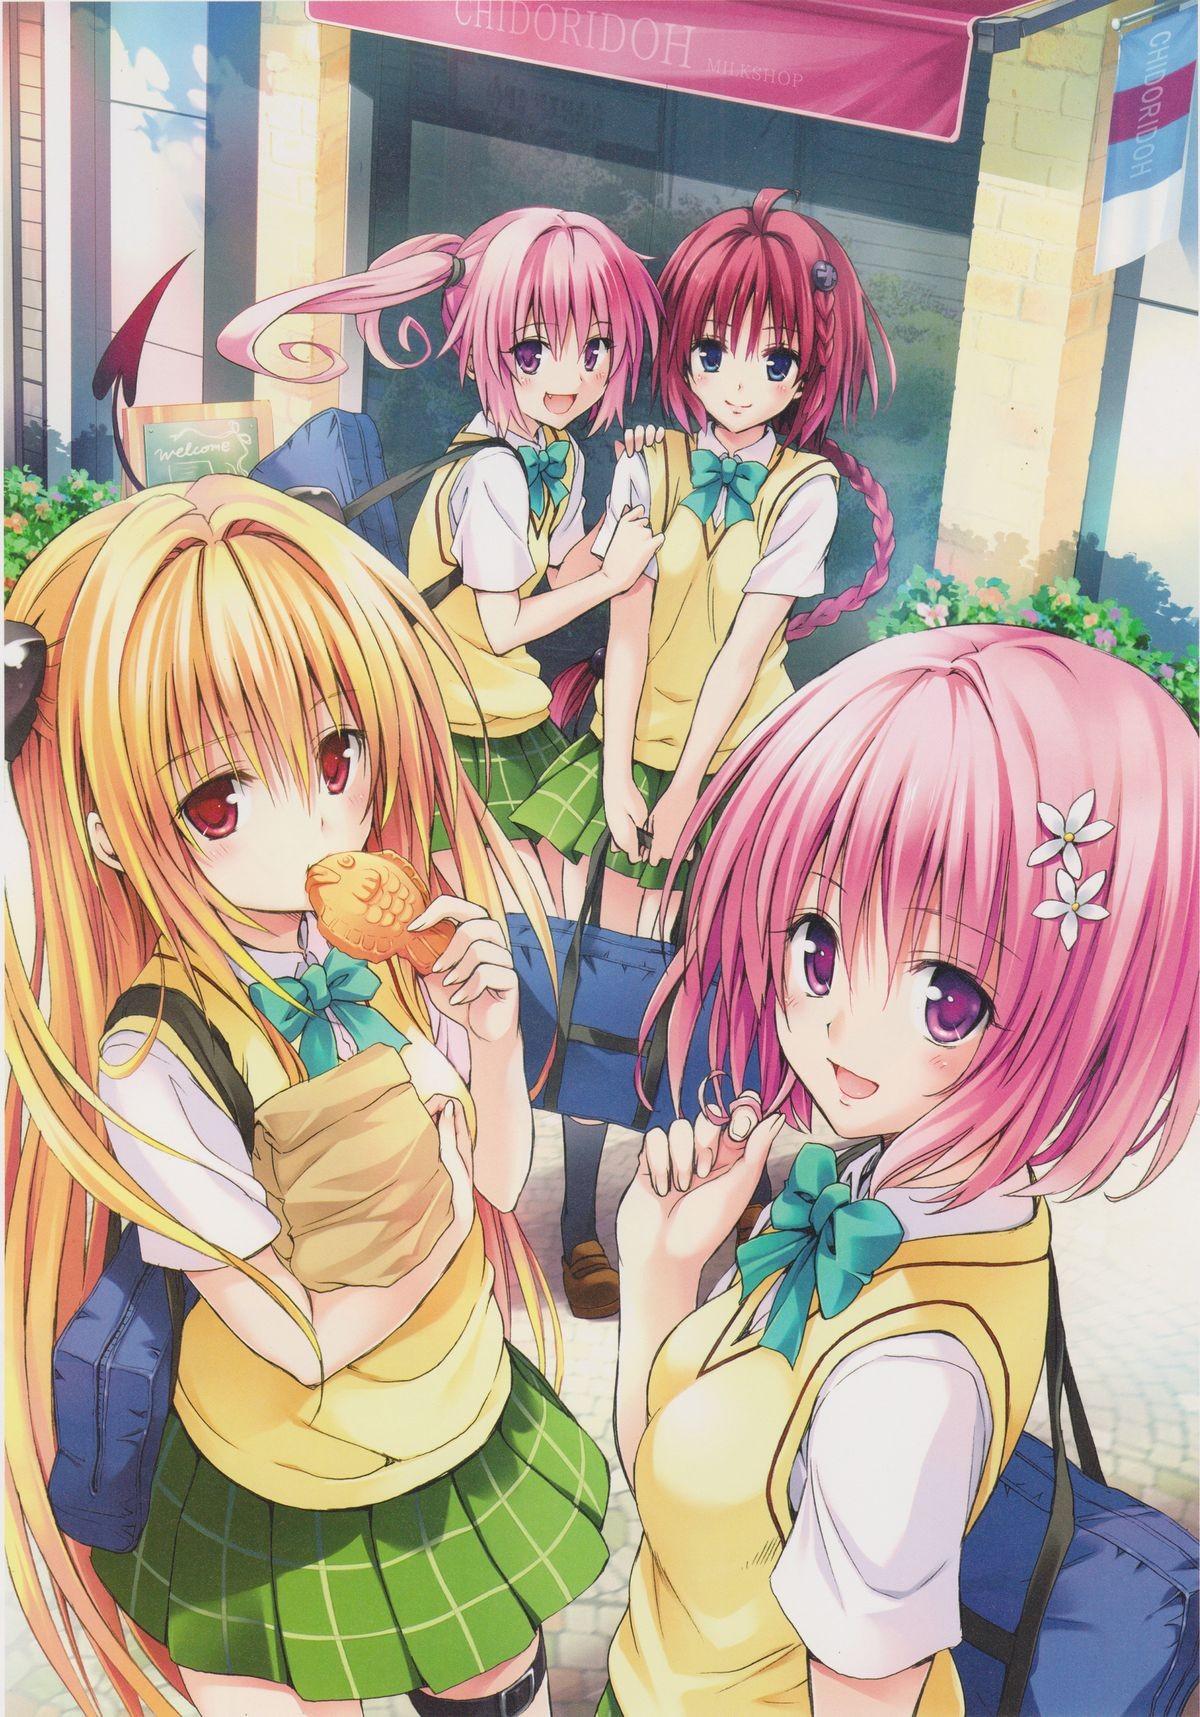 Wallpaper Illustration Blonde Anime Girls To Love Ru Momo